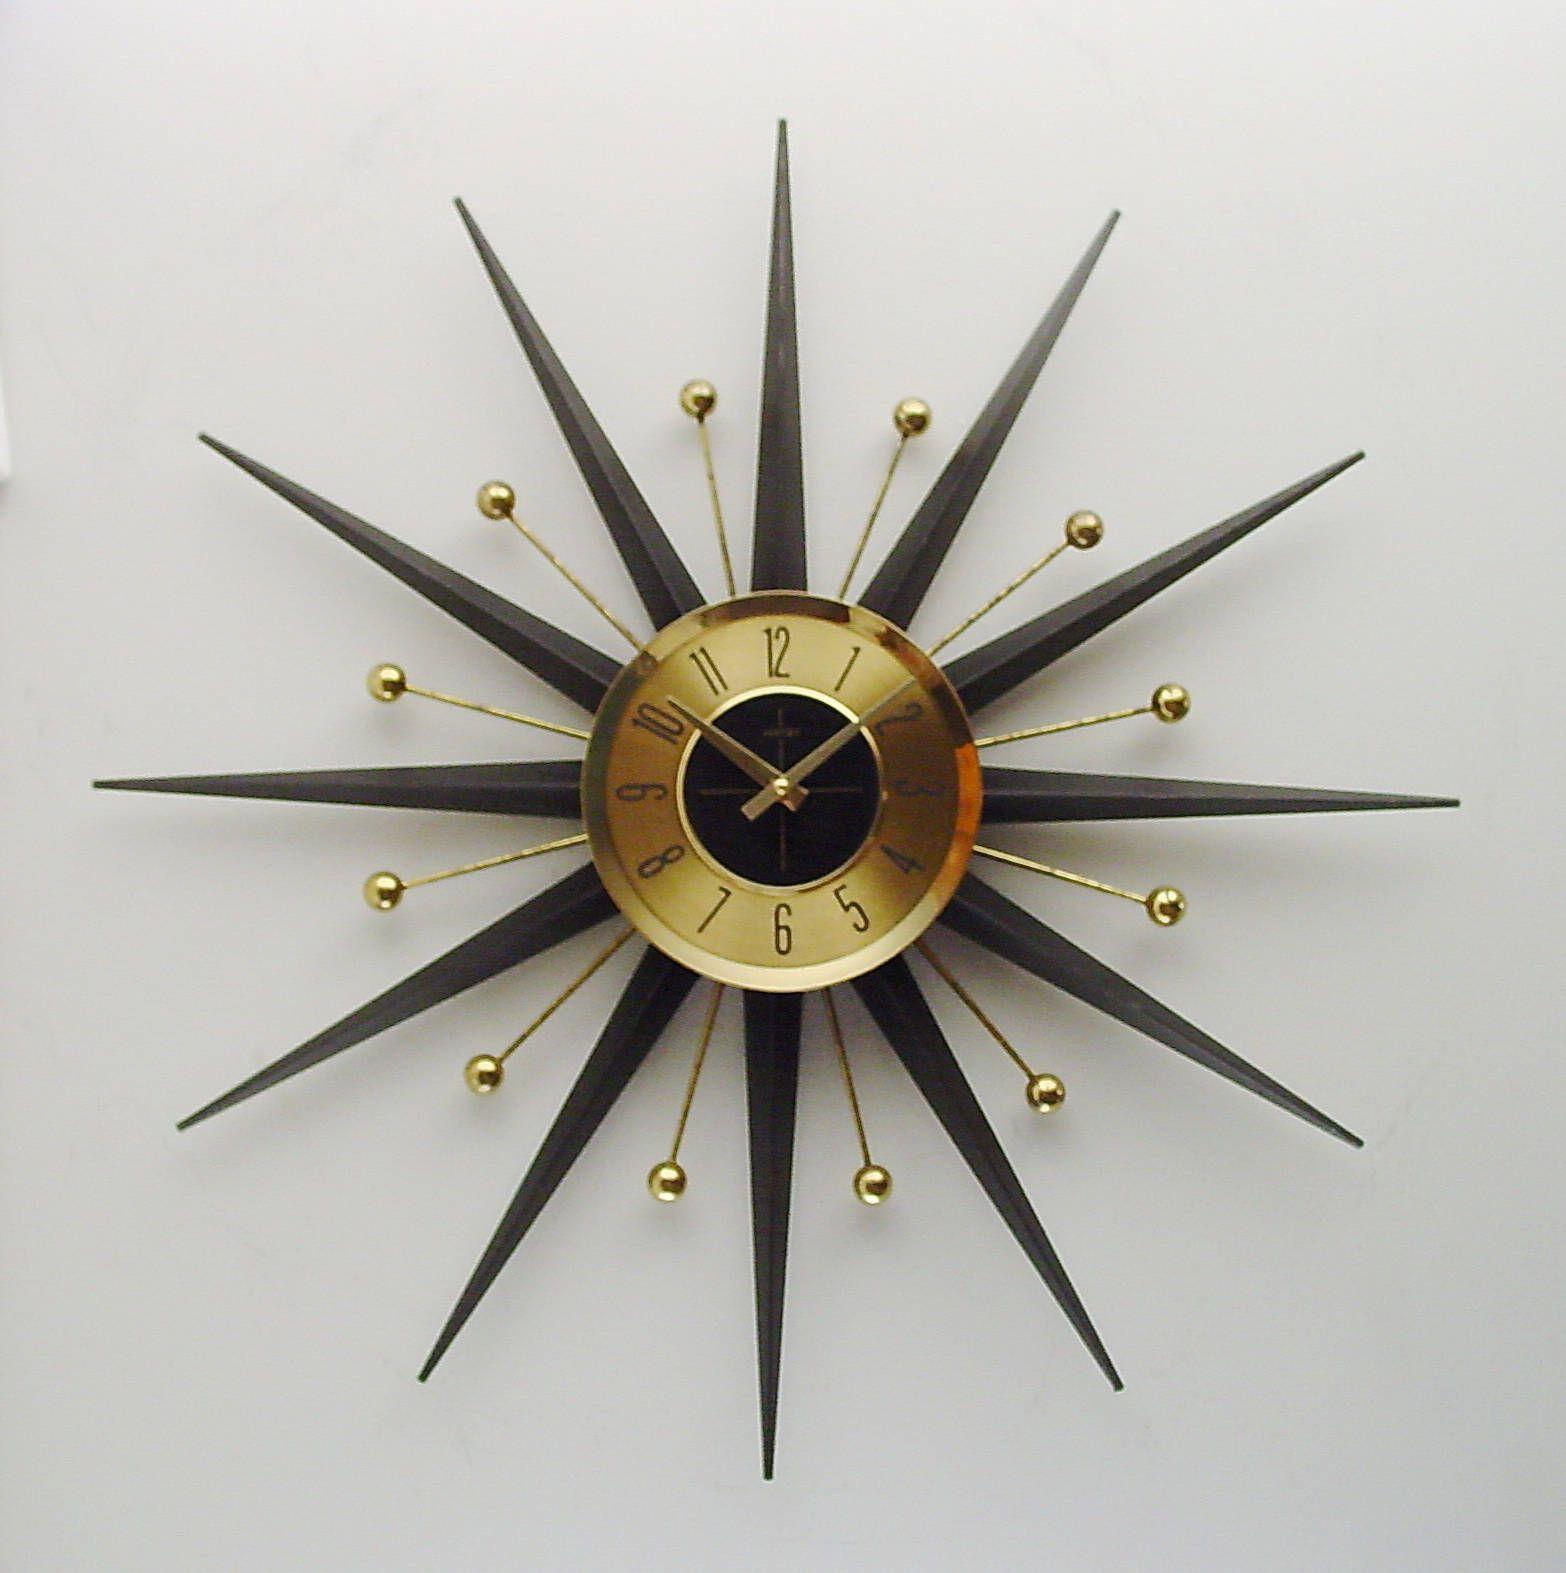 Mid Century Starburst Clock Classic Vintage Atomic Era Design By Welby Mid Century Modern 1960s Sunburst Wall Clock Clock Sunburst Clock Wall Clock